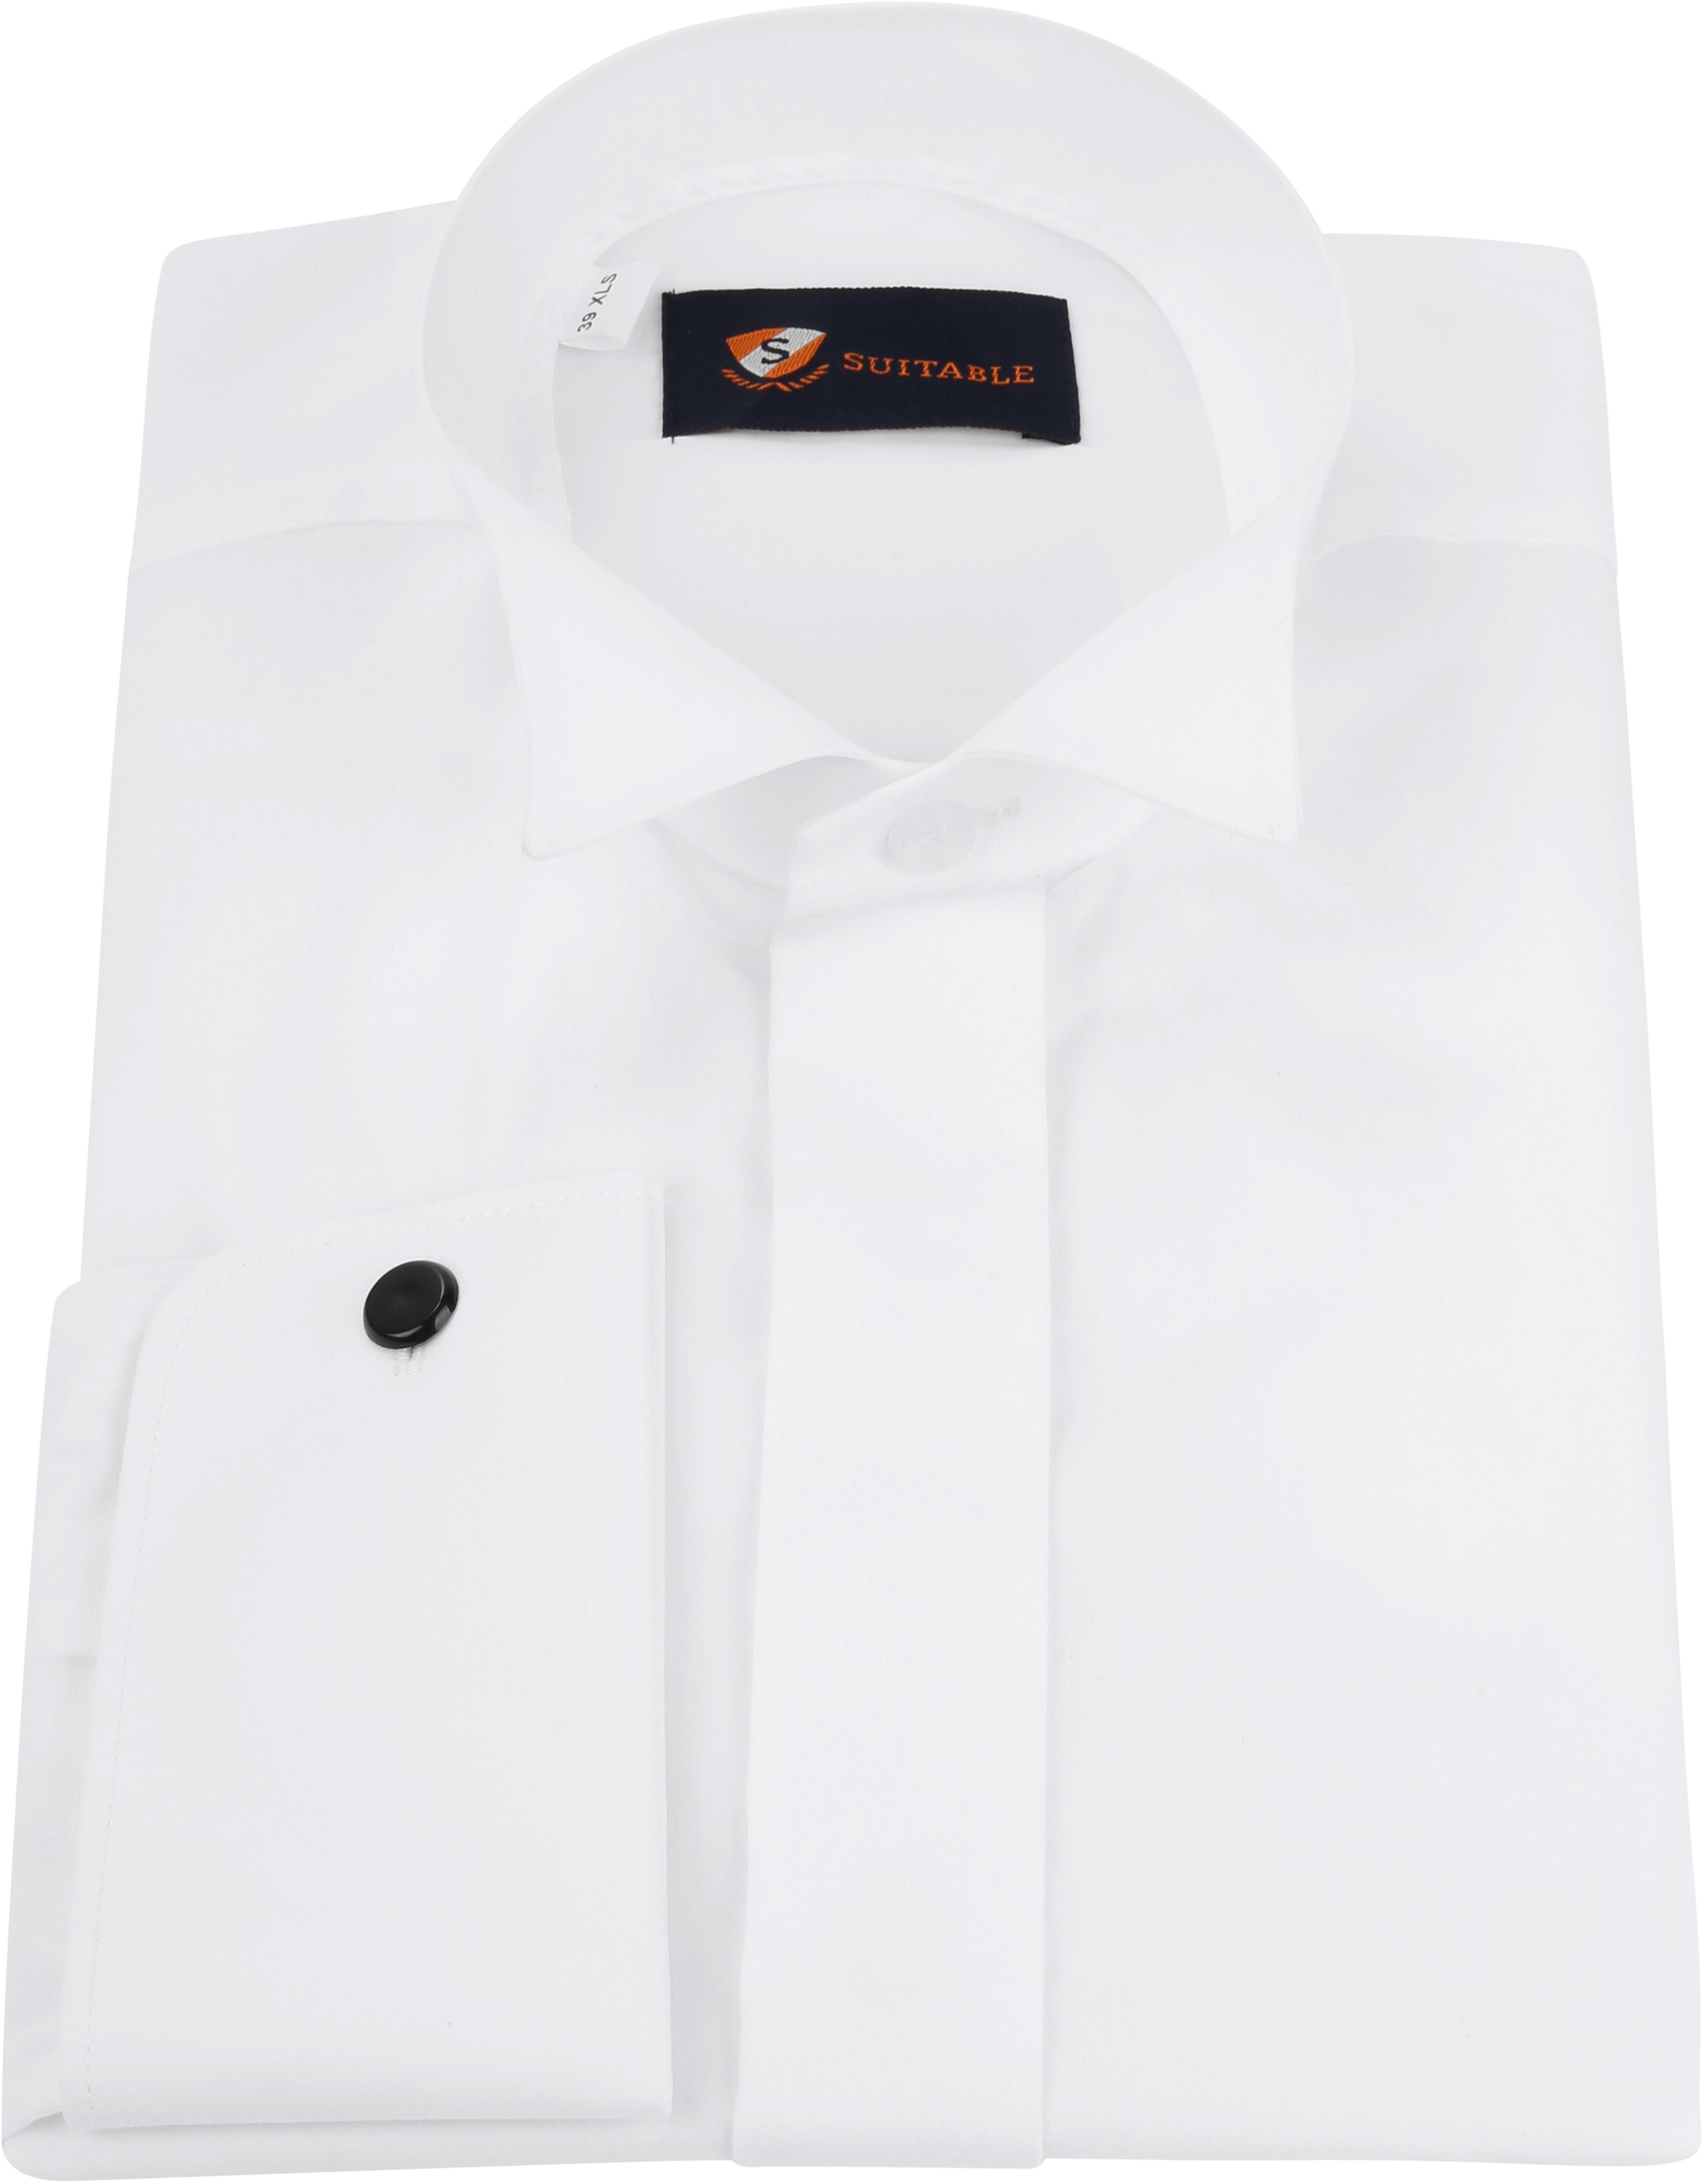 Suitable Hemd Weiß Plissiert